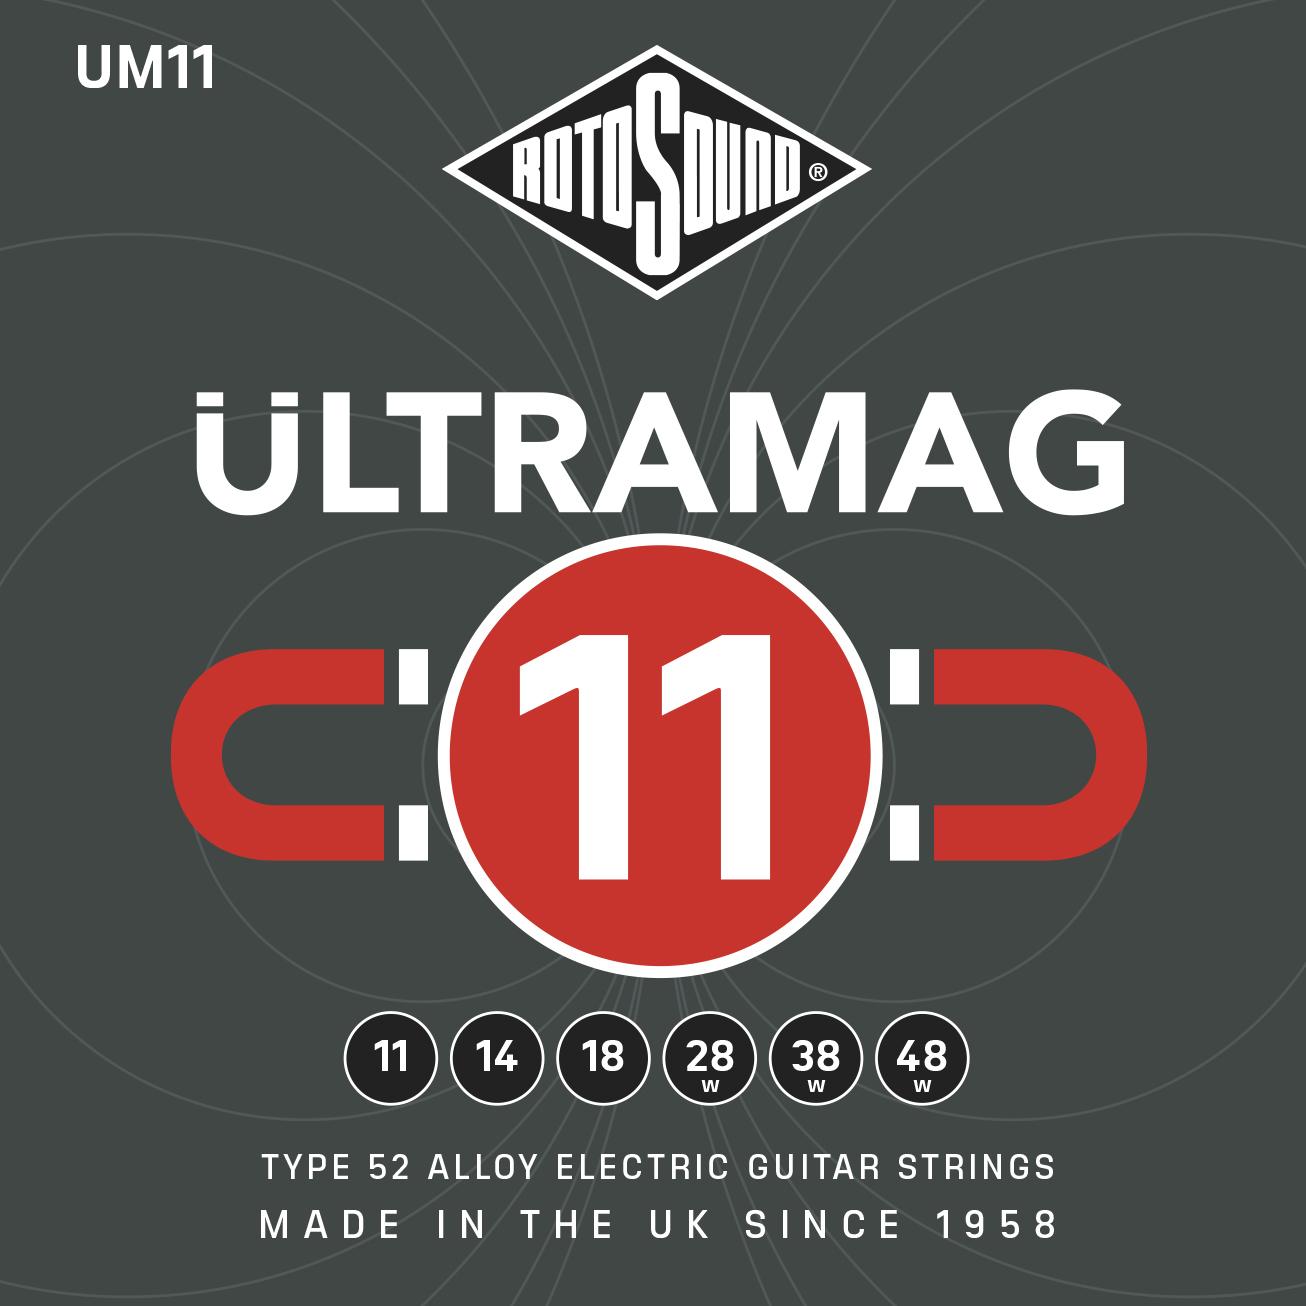 Rotosound UM11 Ultramag Guitar Strings: Strings